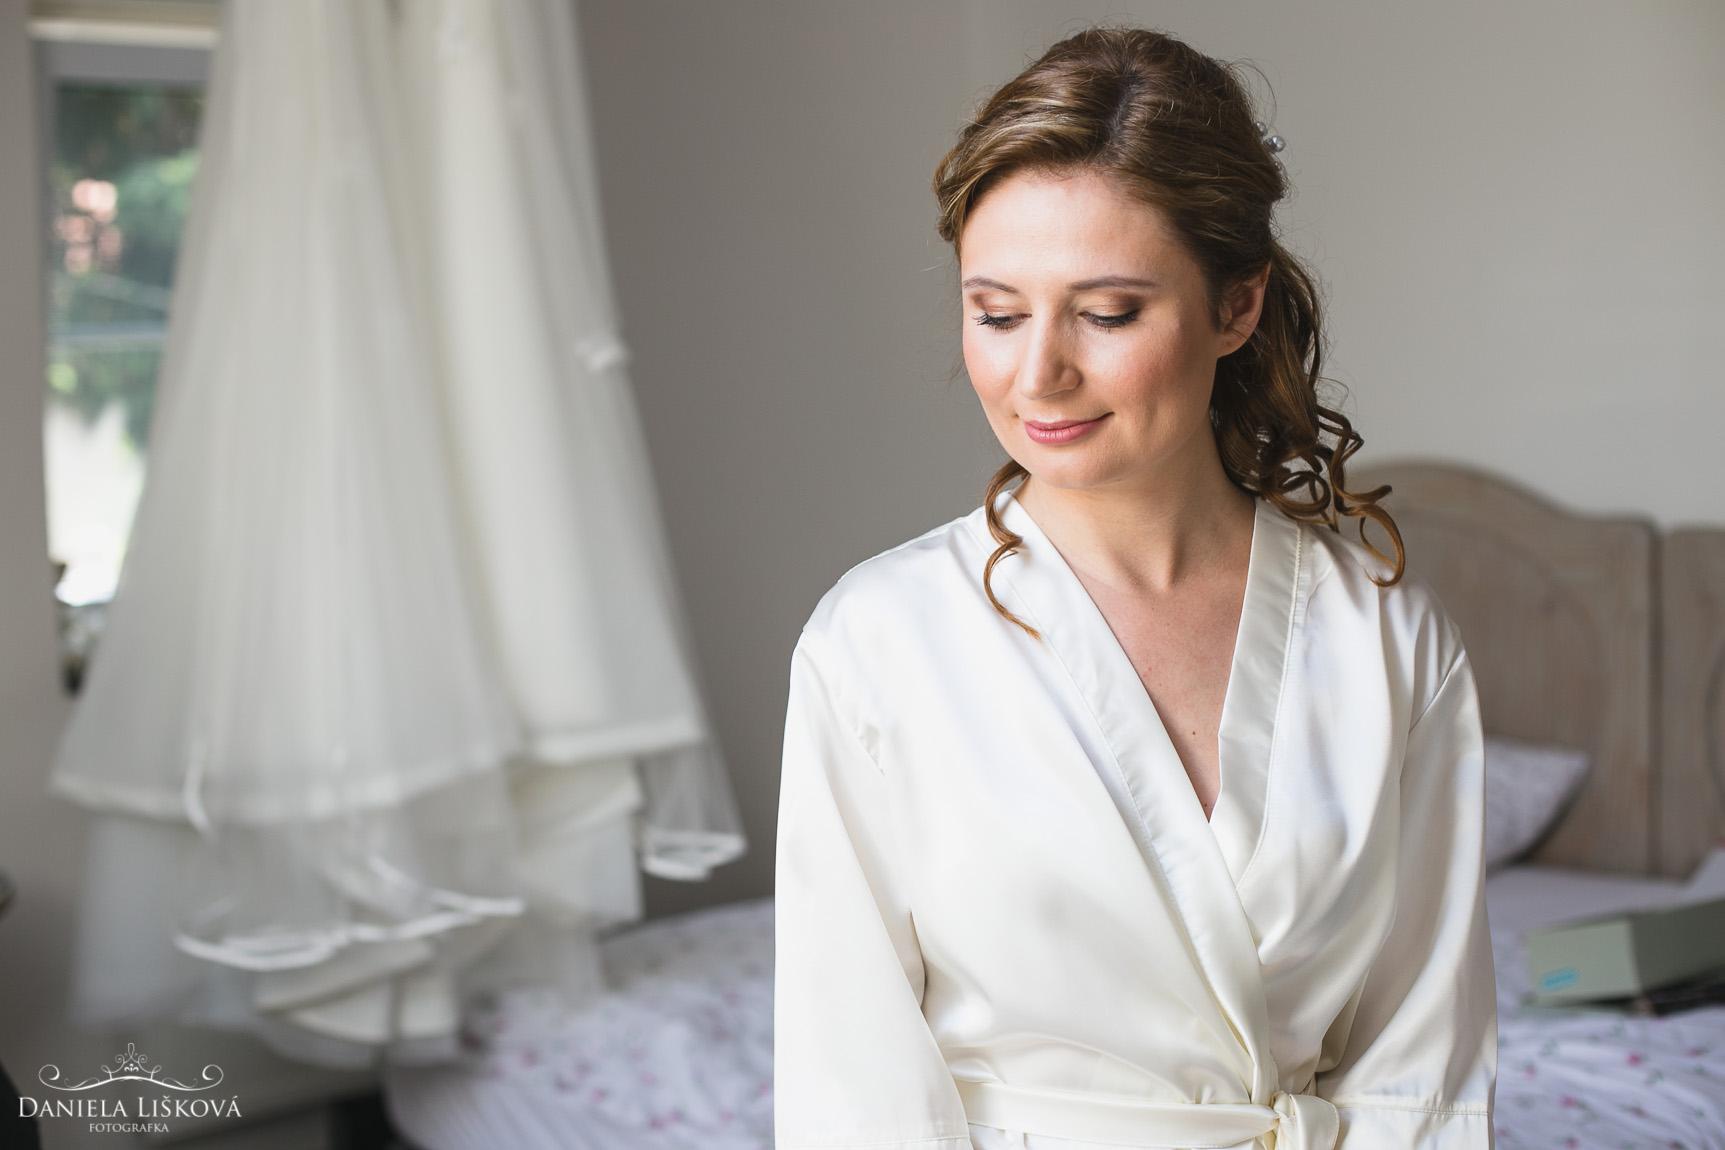 svatební fotografka Daniela Lišková-2.jpg